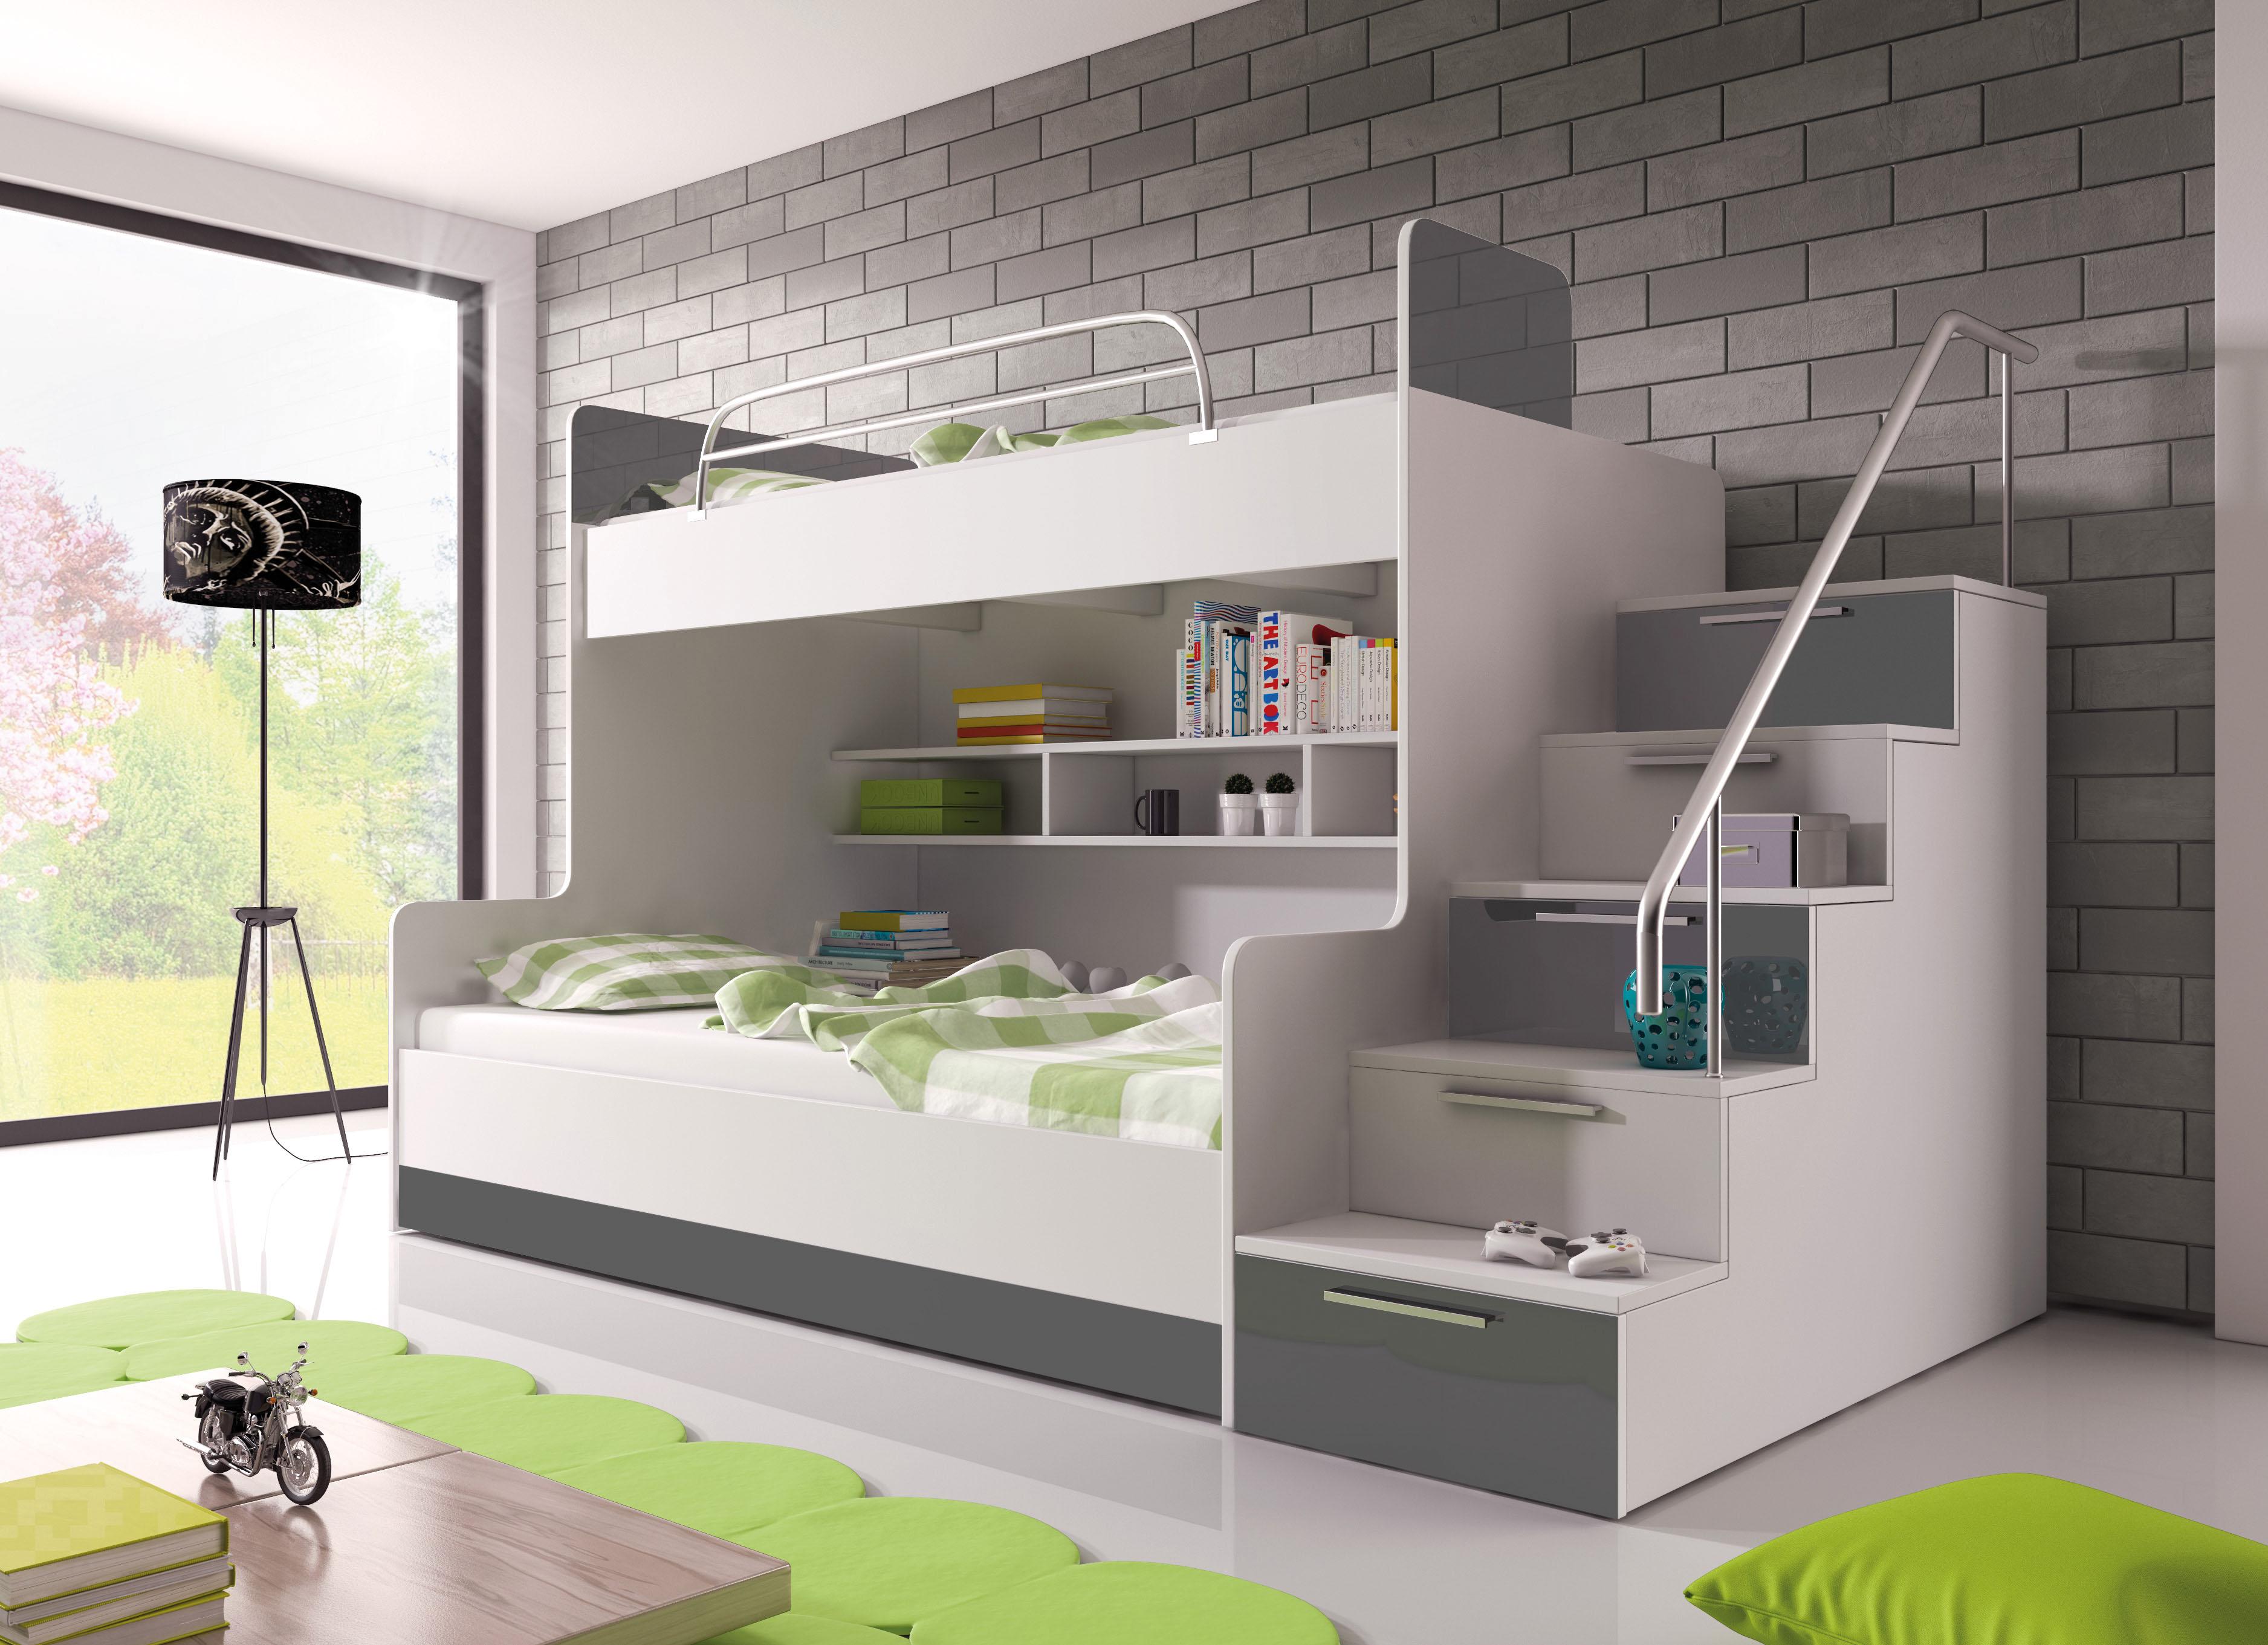 Patrová postel - Ruby II (bílá + šedá) (s matrací a roštem)